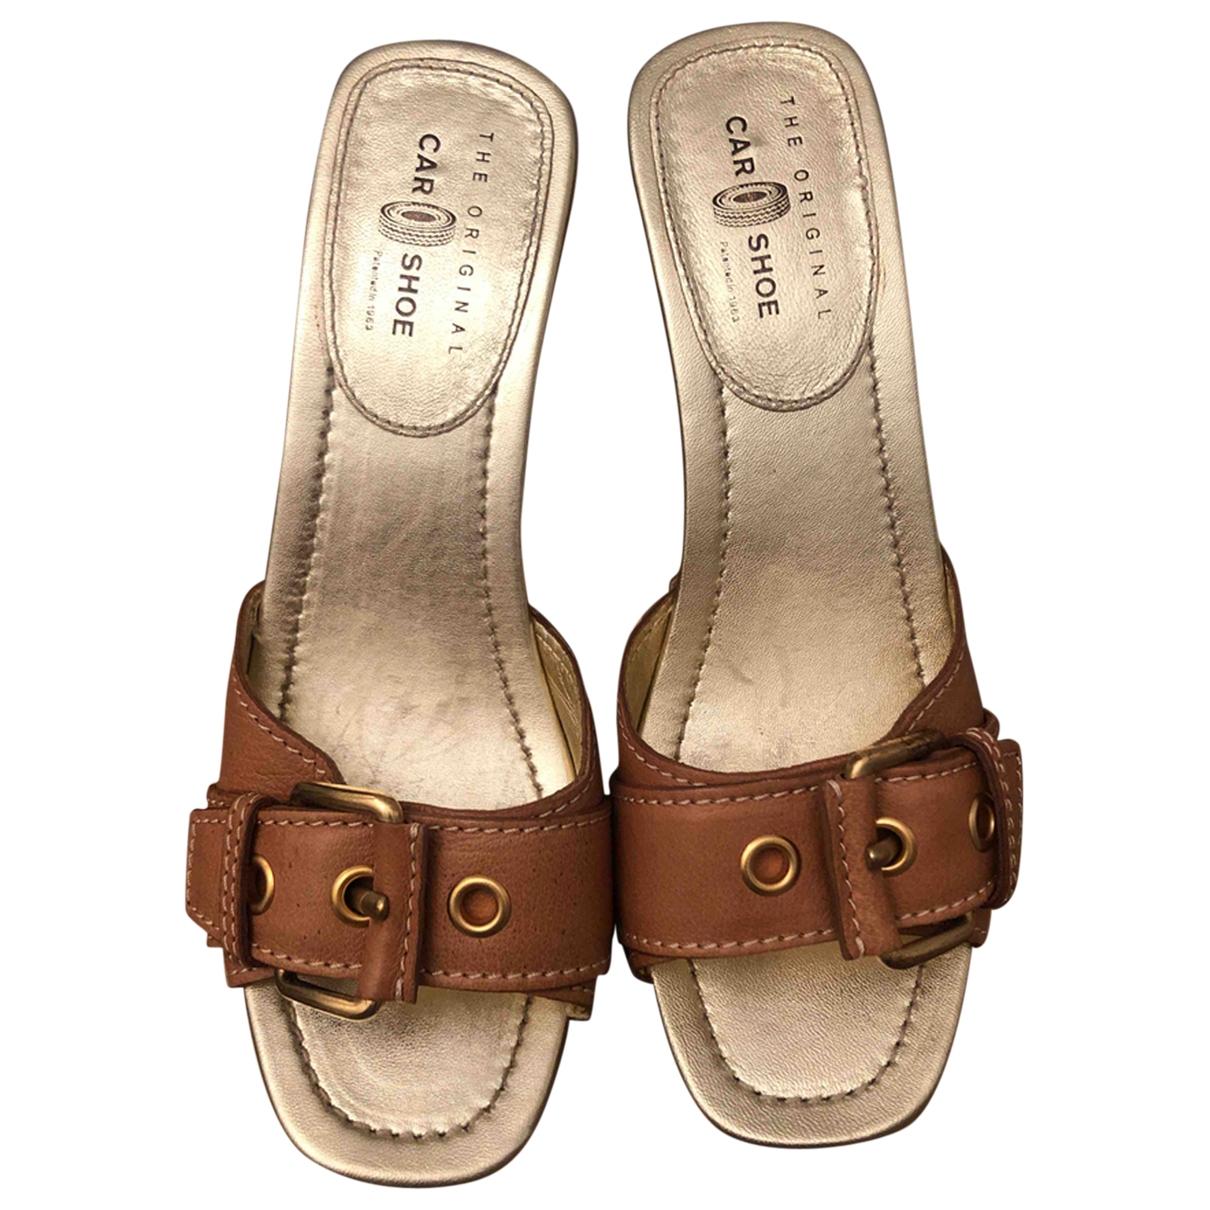 Carshoe \N Clogs in  Beige Leder